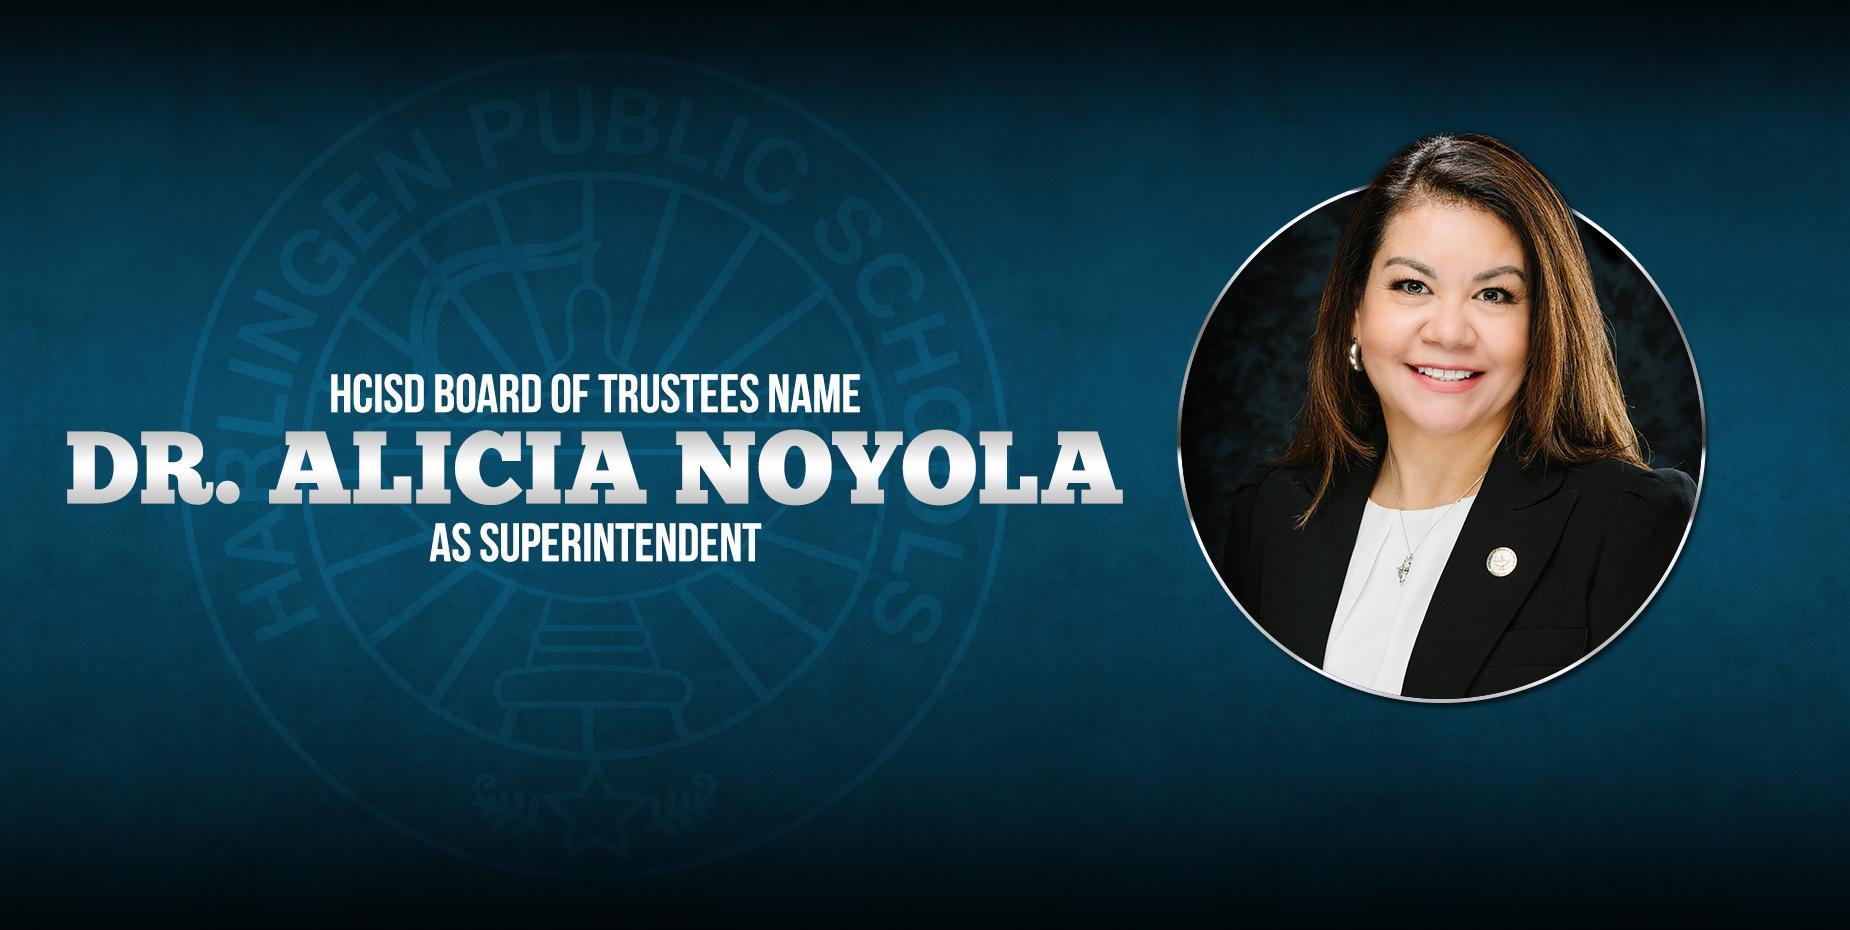 HCISD Board of Trustees Name Dr. Alicia Noyola as Superintendent